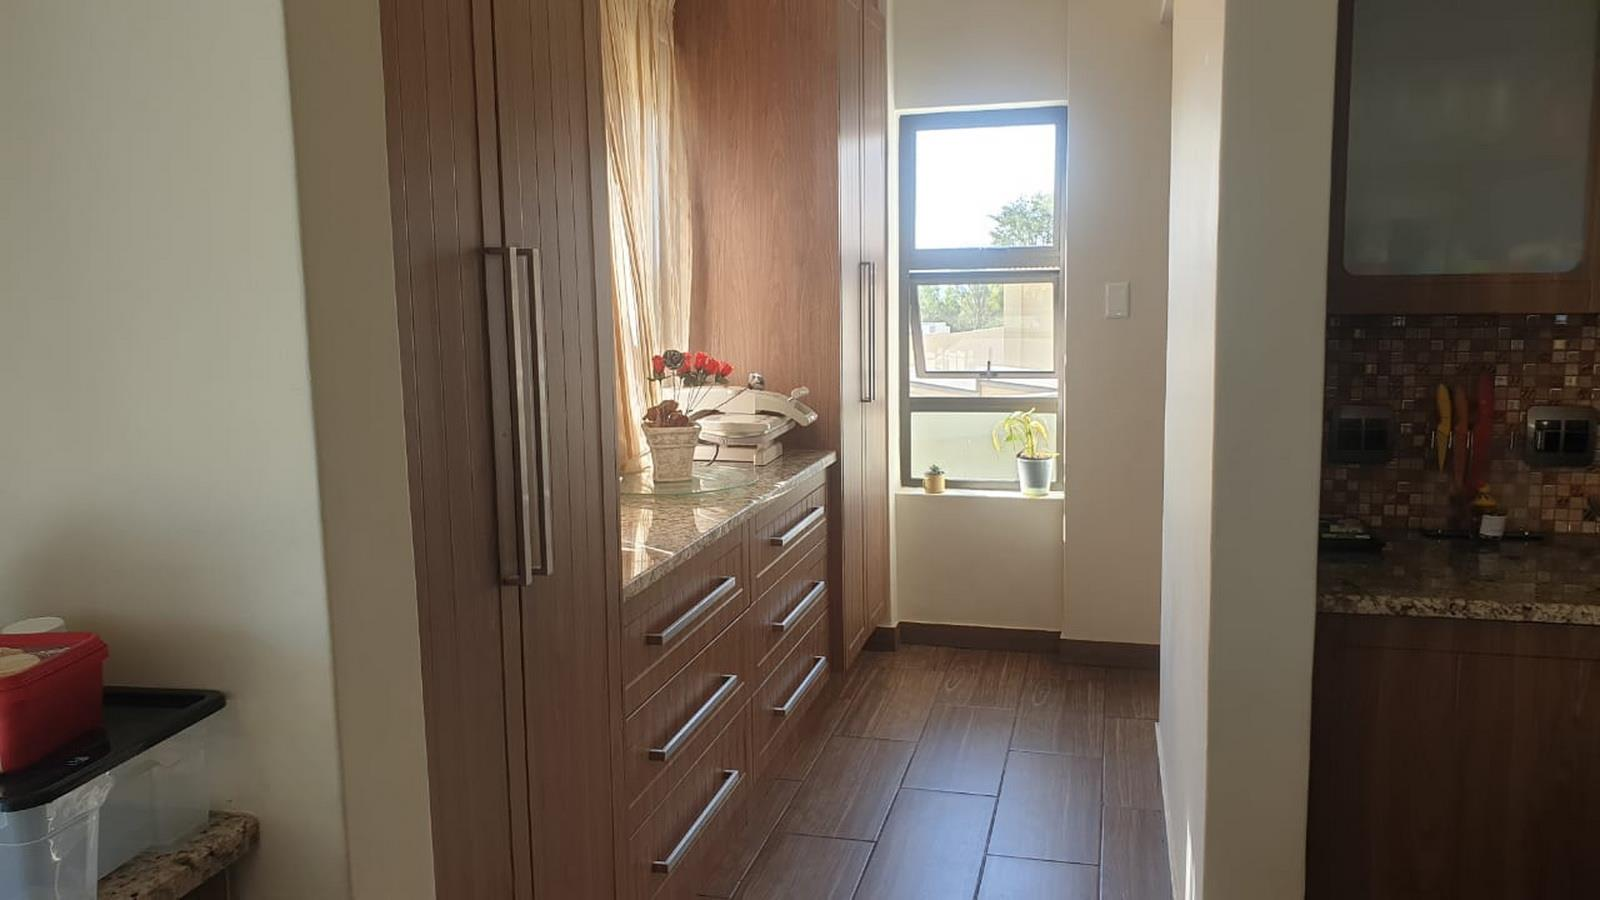 House Rental Monthly in Bankenveld